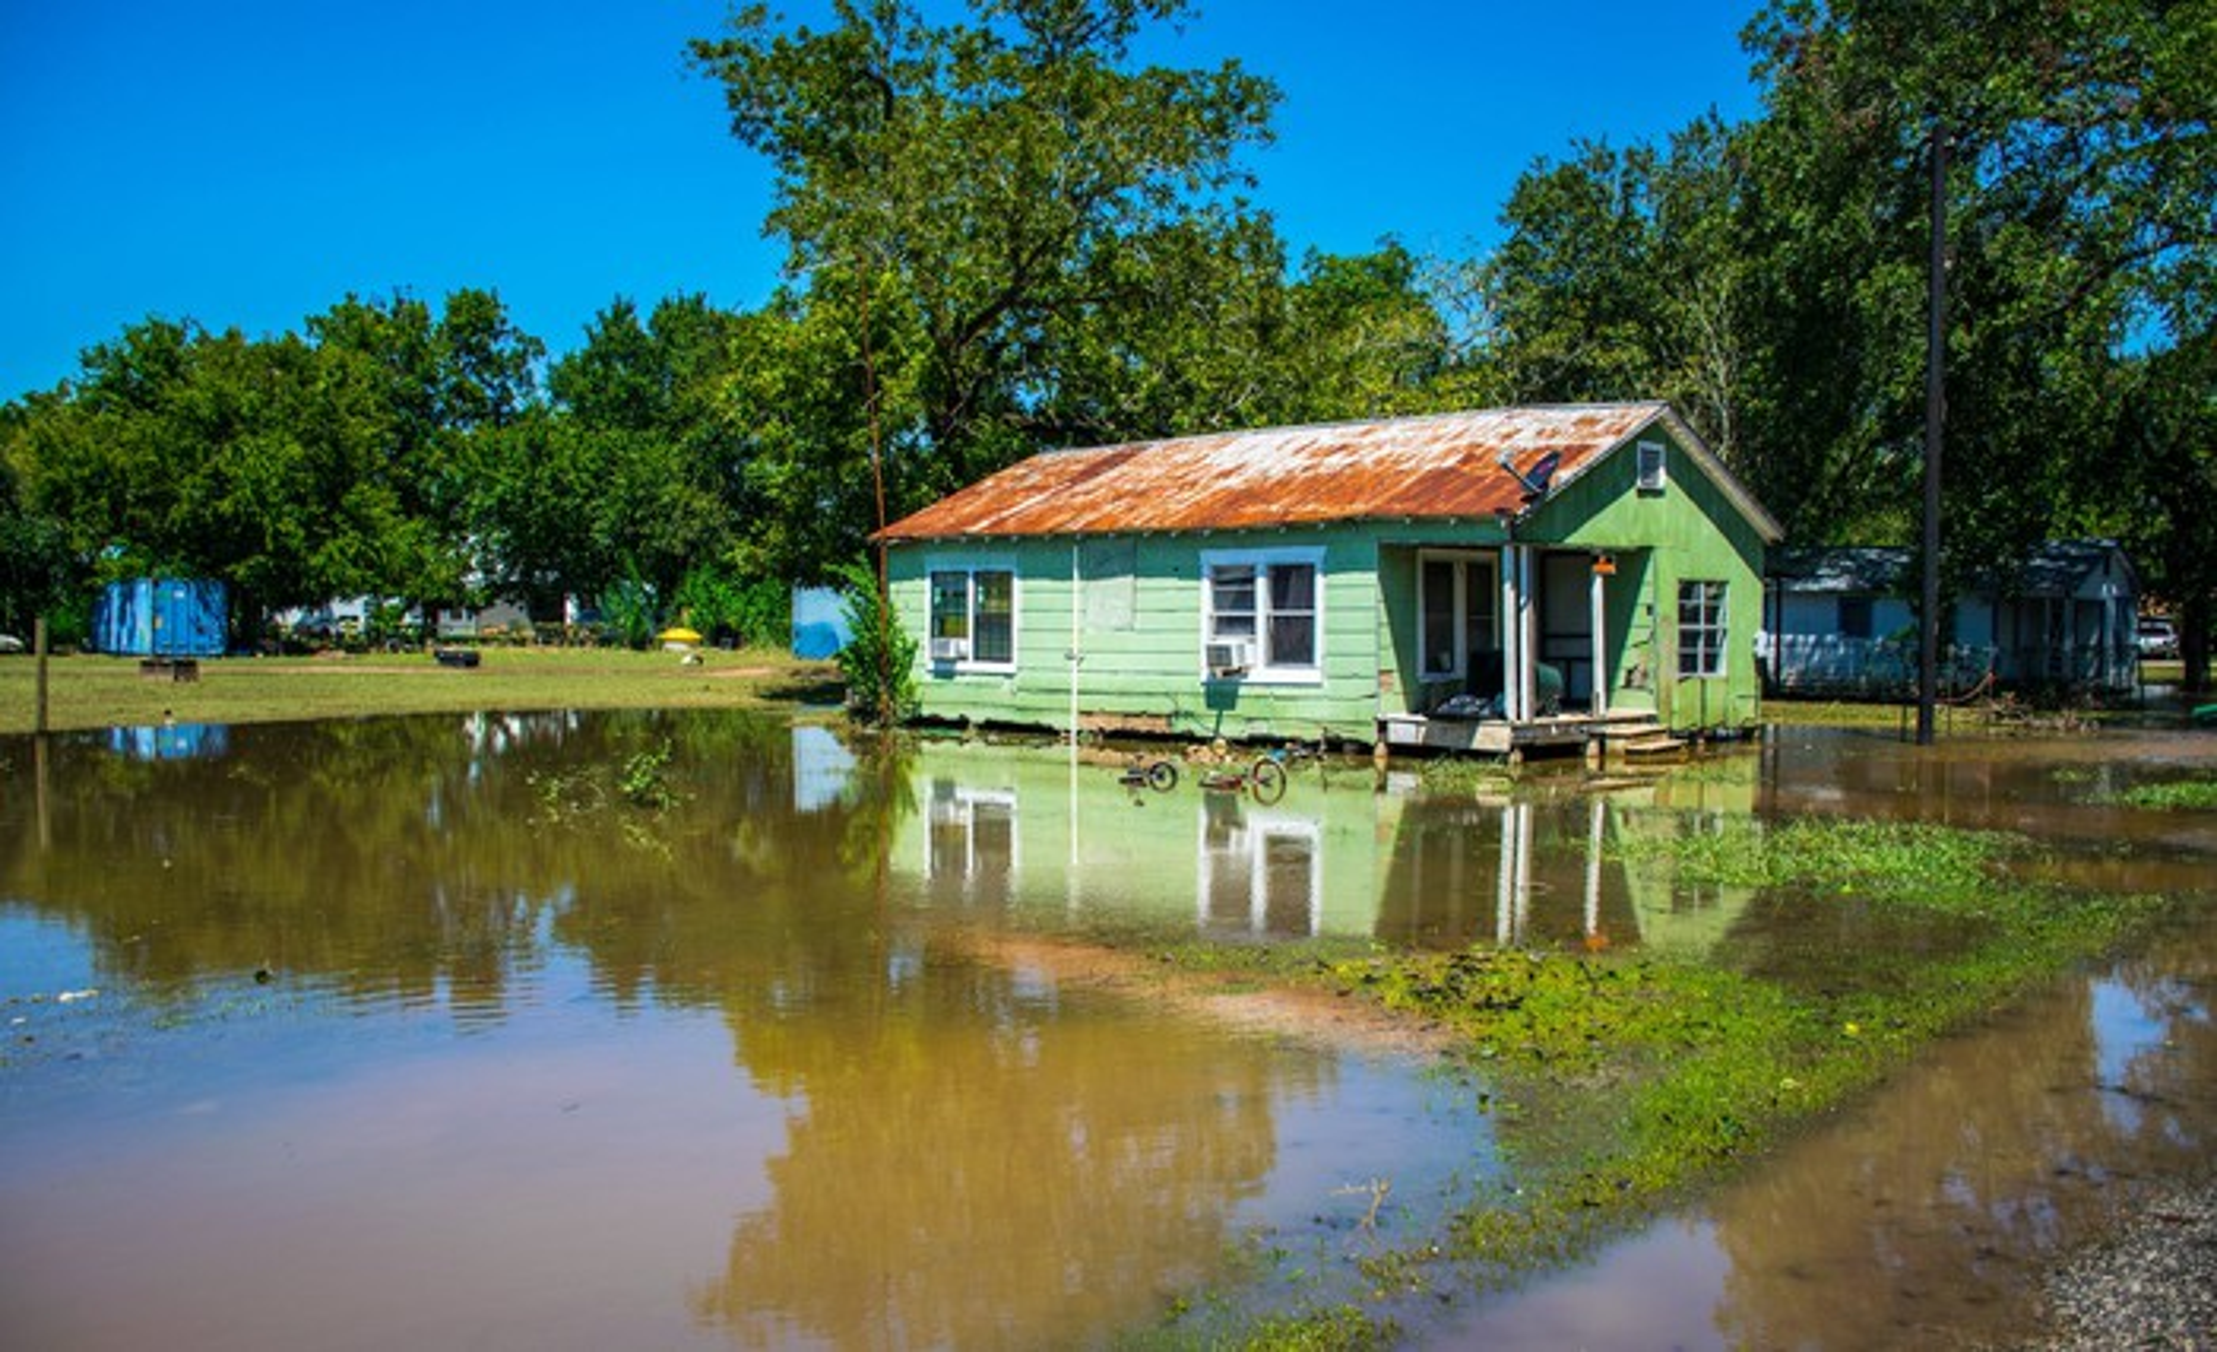 A hurricane-flooded home in Texas.